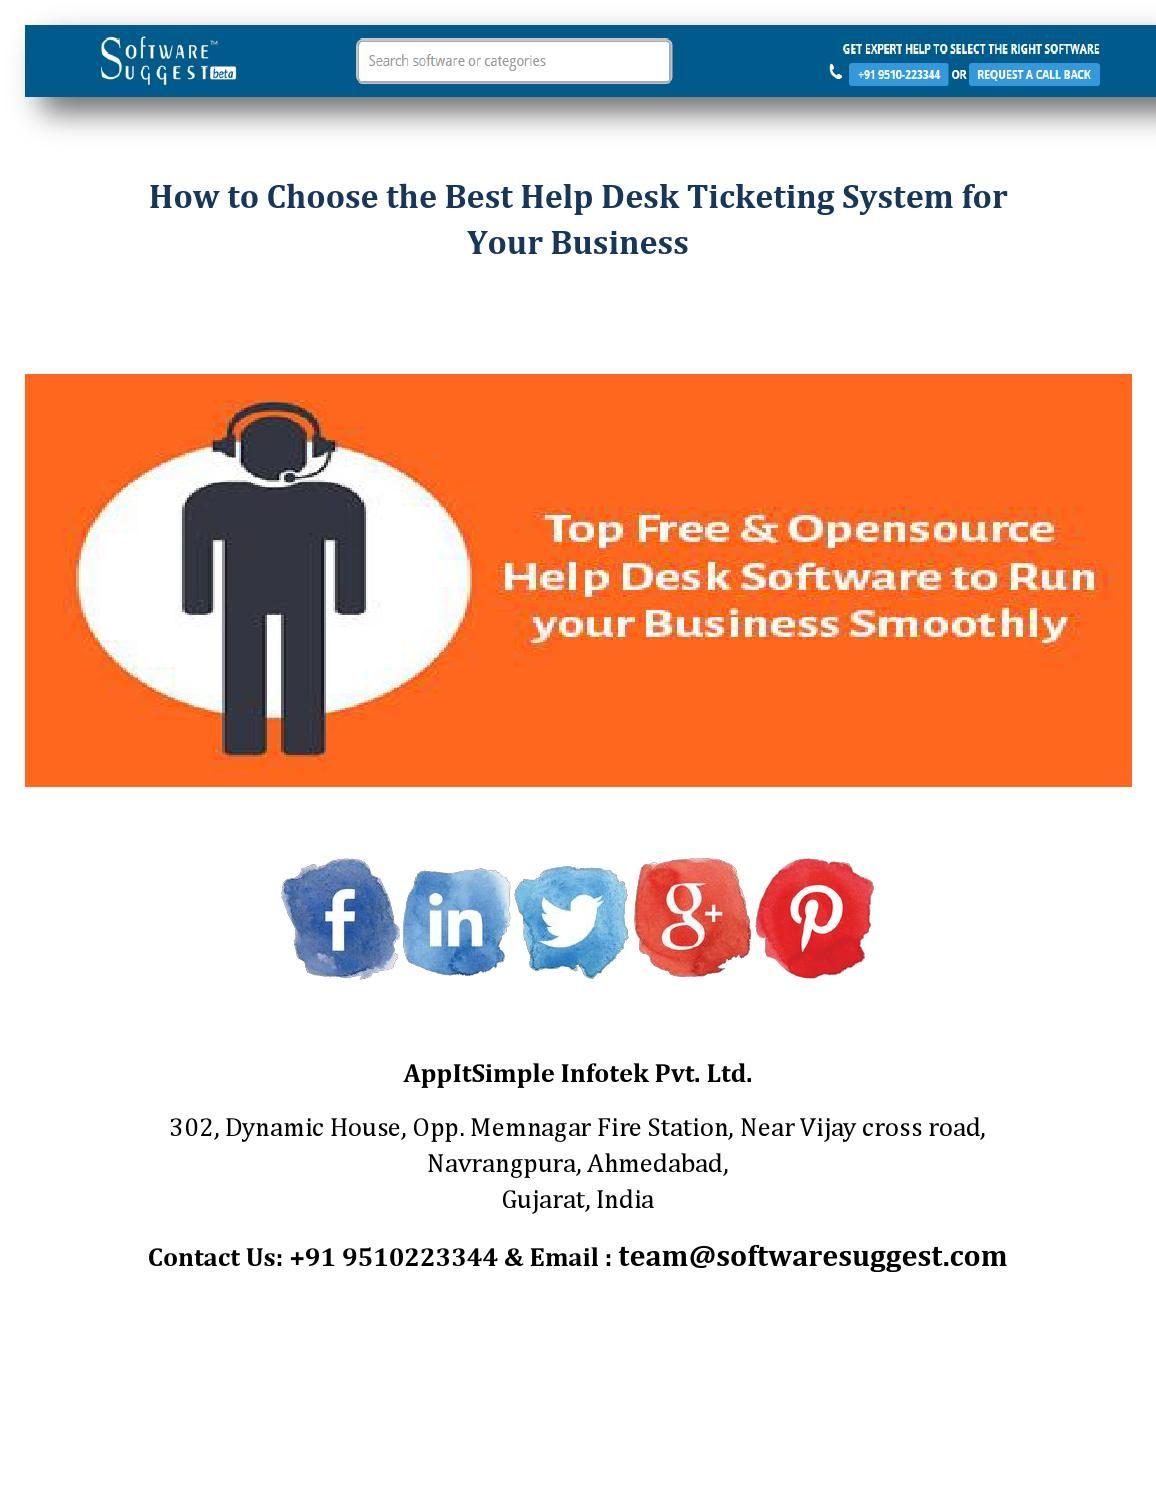 Helpdesk Ticketing Software Help Desk Software Help Desk